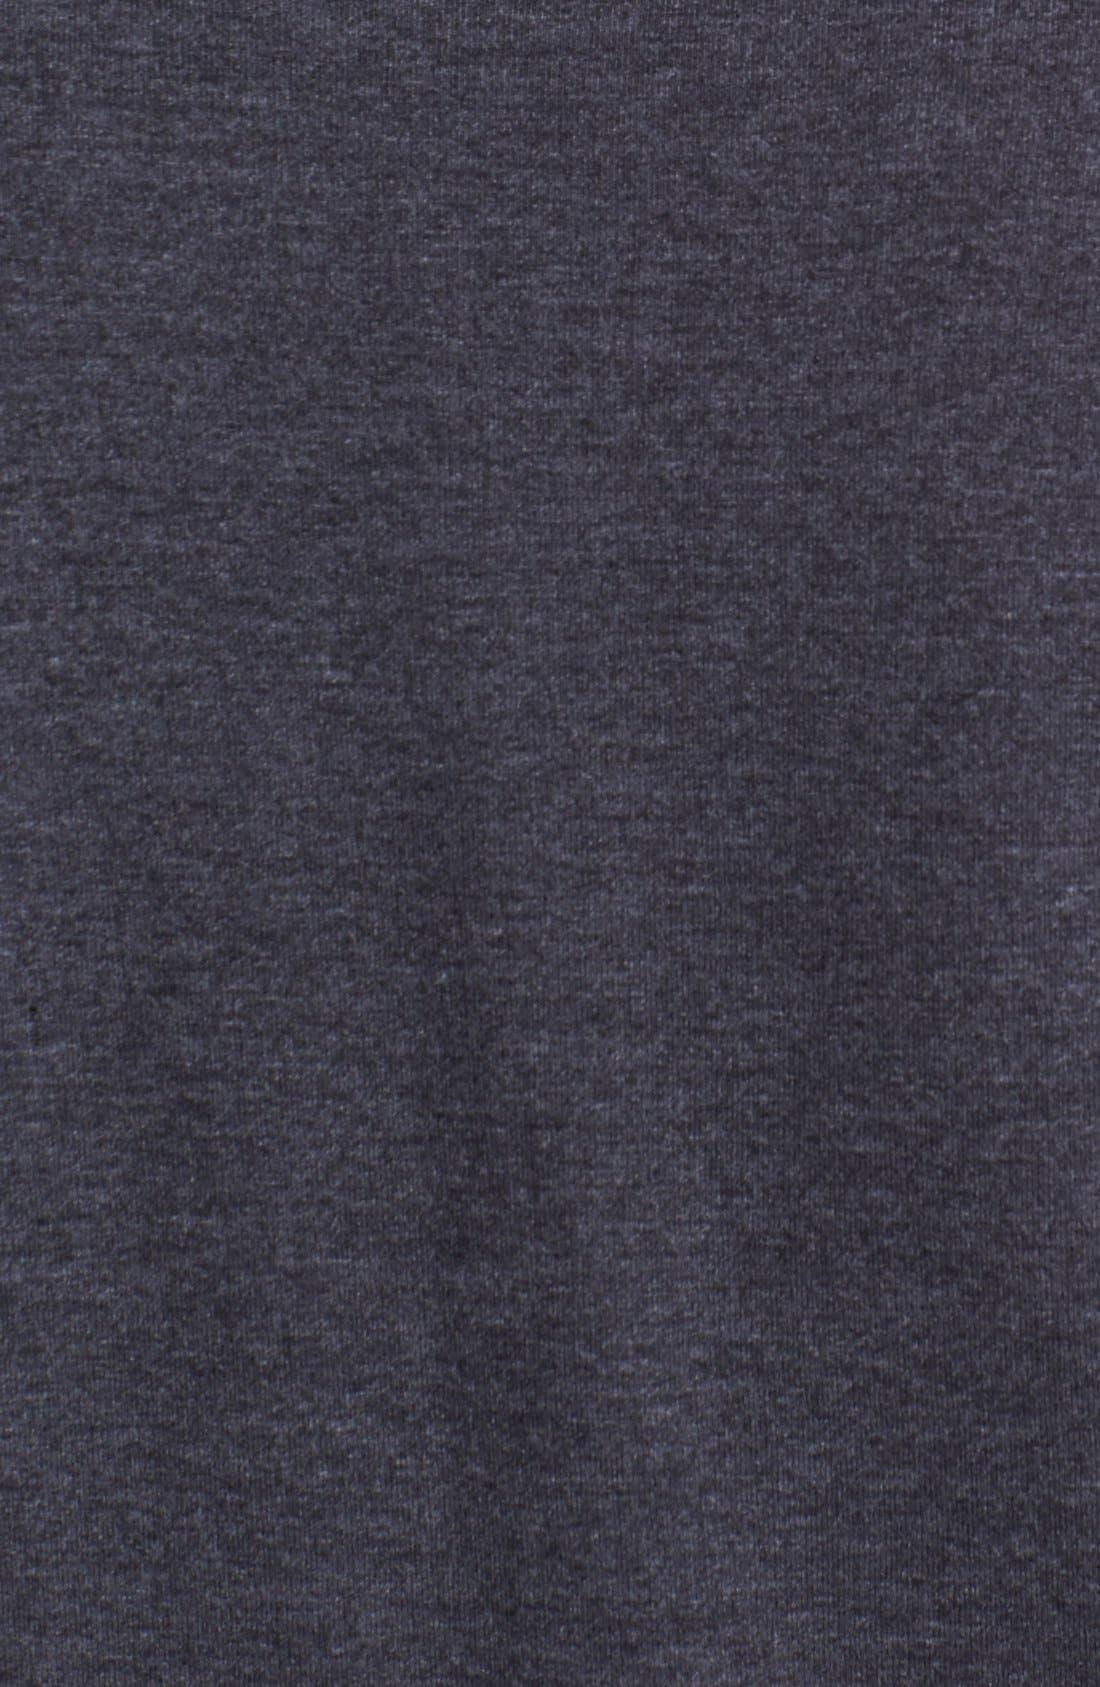 Alternate Image 3  - Billy Reid Raglan Crewneck Sweatshirt